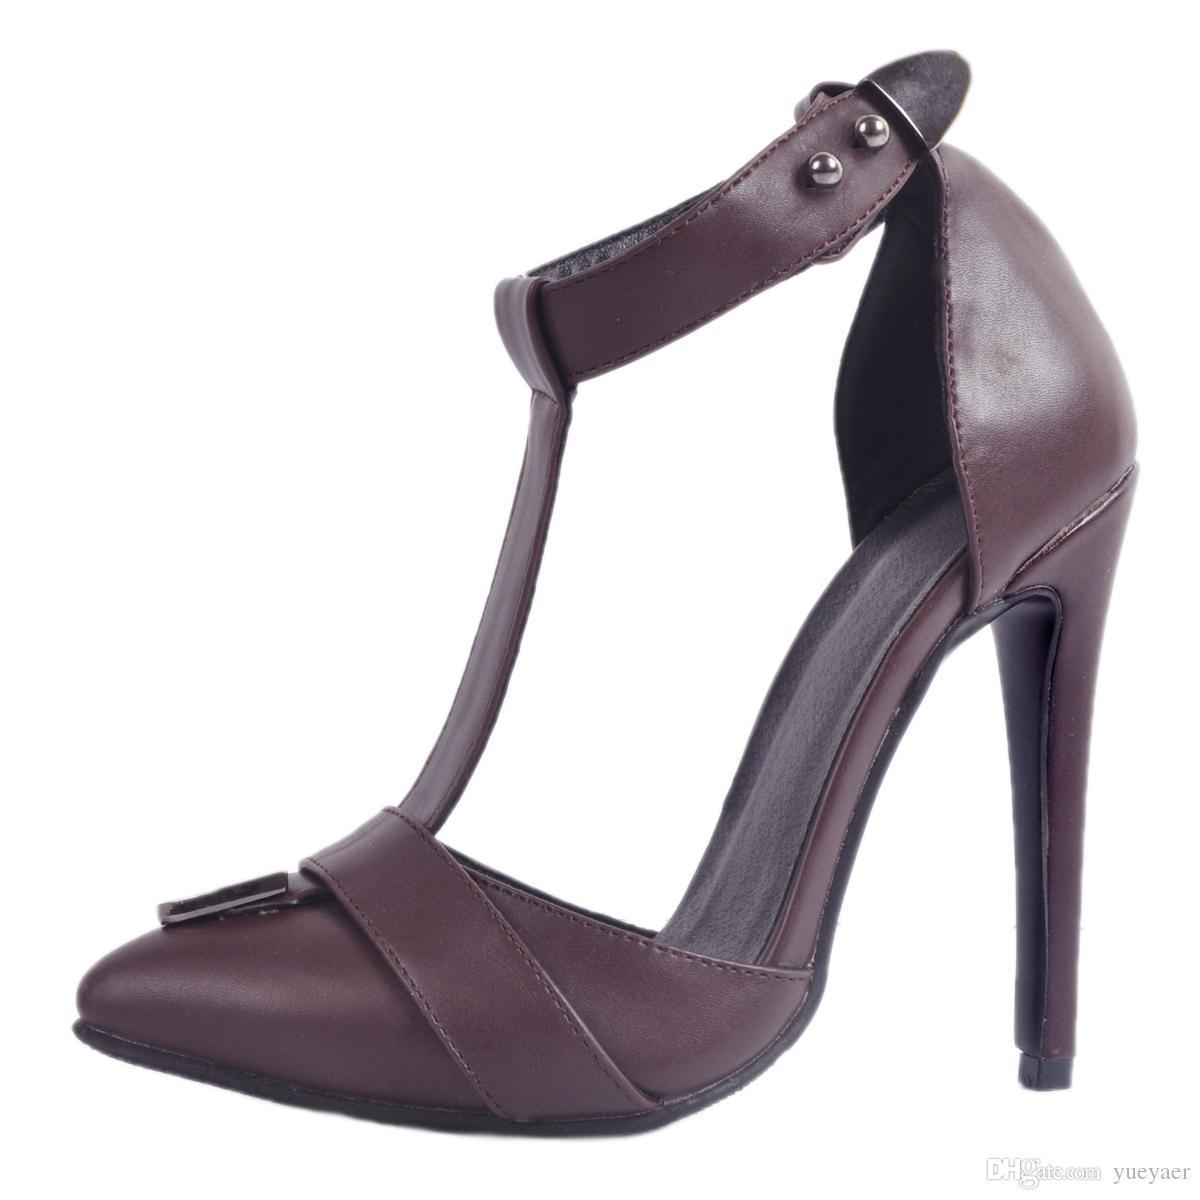 Zandina Das Mulheres Artesanais Das Mulheres de Salto Alto Sandálias T-cinta Apontou Toe Simples Casual Partido Dailywear Sapatos Da Moda A024